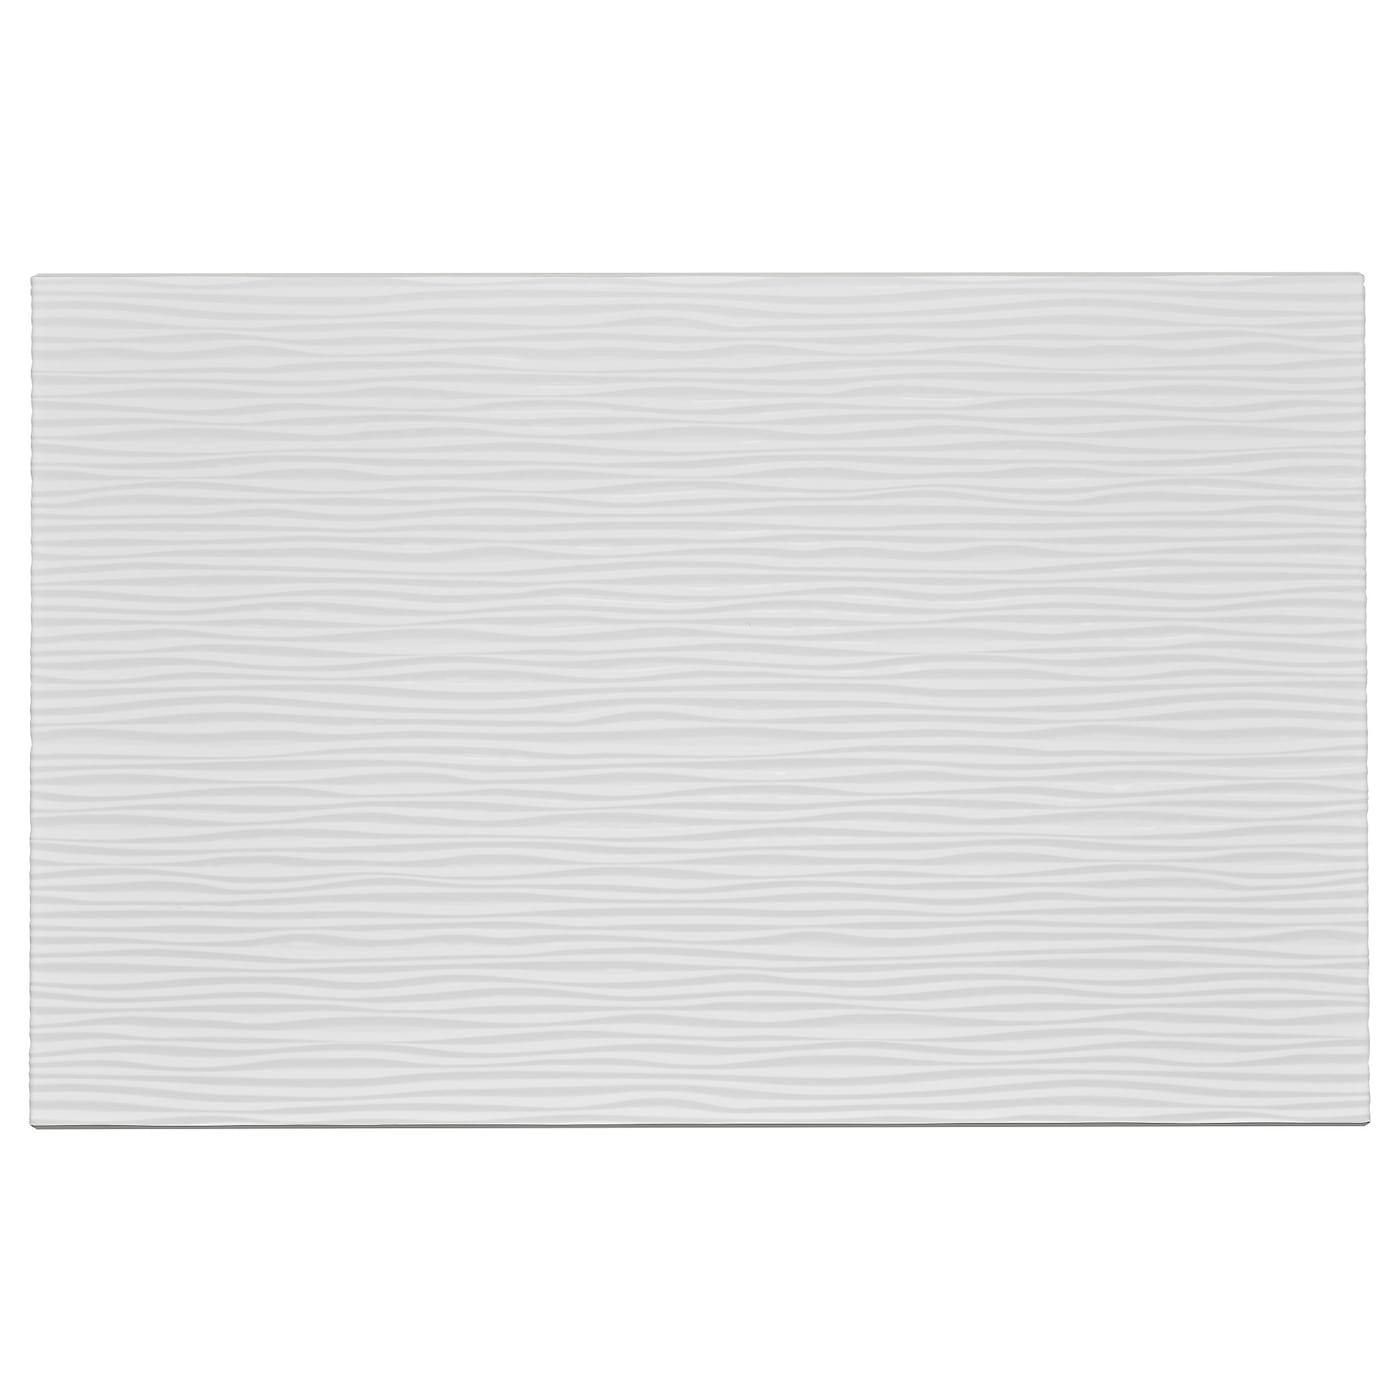 laxviken door drawer front white 60x38 cm ikea. Black Bedroom Furniture Sets. Home Design Ideas